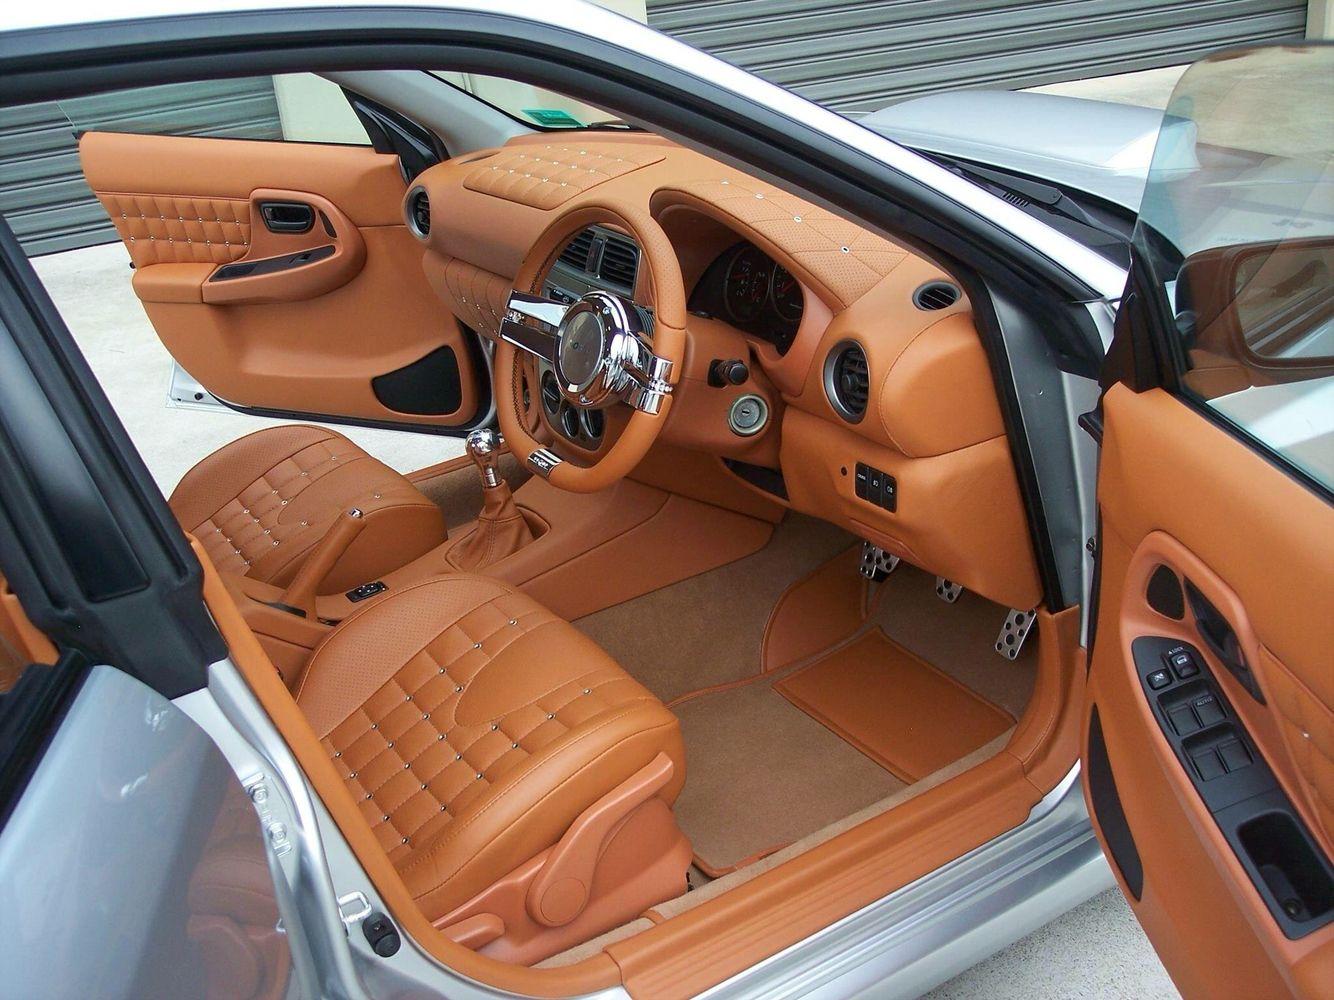 Blackneedle auto upholstery 04 wrx custom leather interior